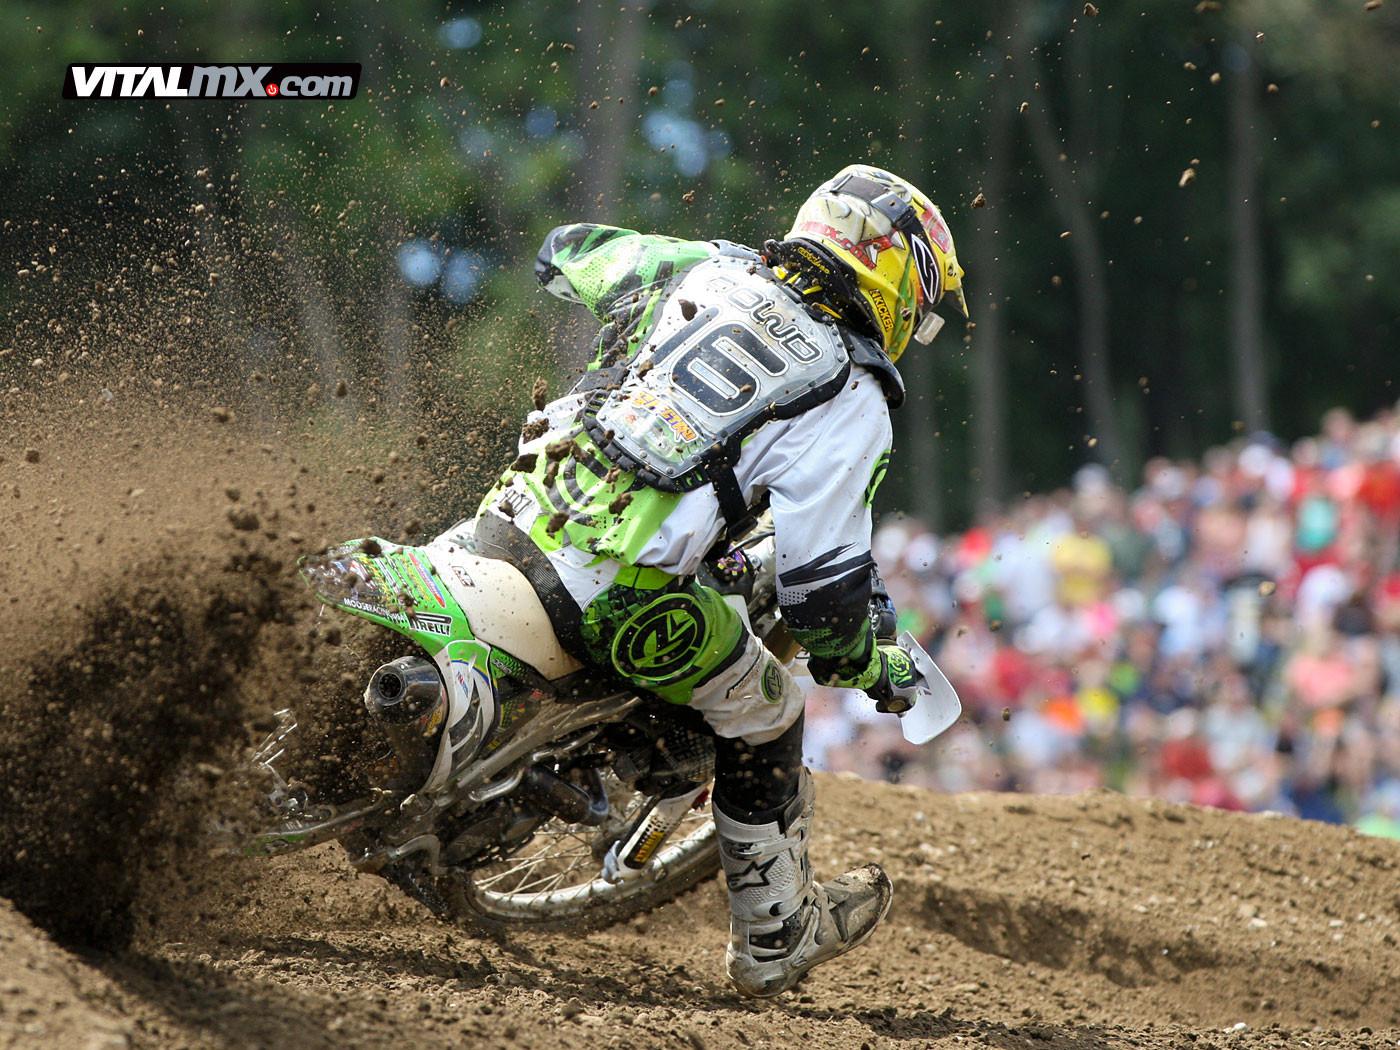 Pic o' The Day: John Dowd - Pic o' The Day: John Dowd - Motocross Pictures - Vital MX